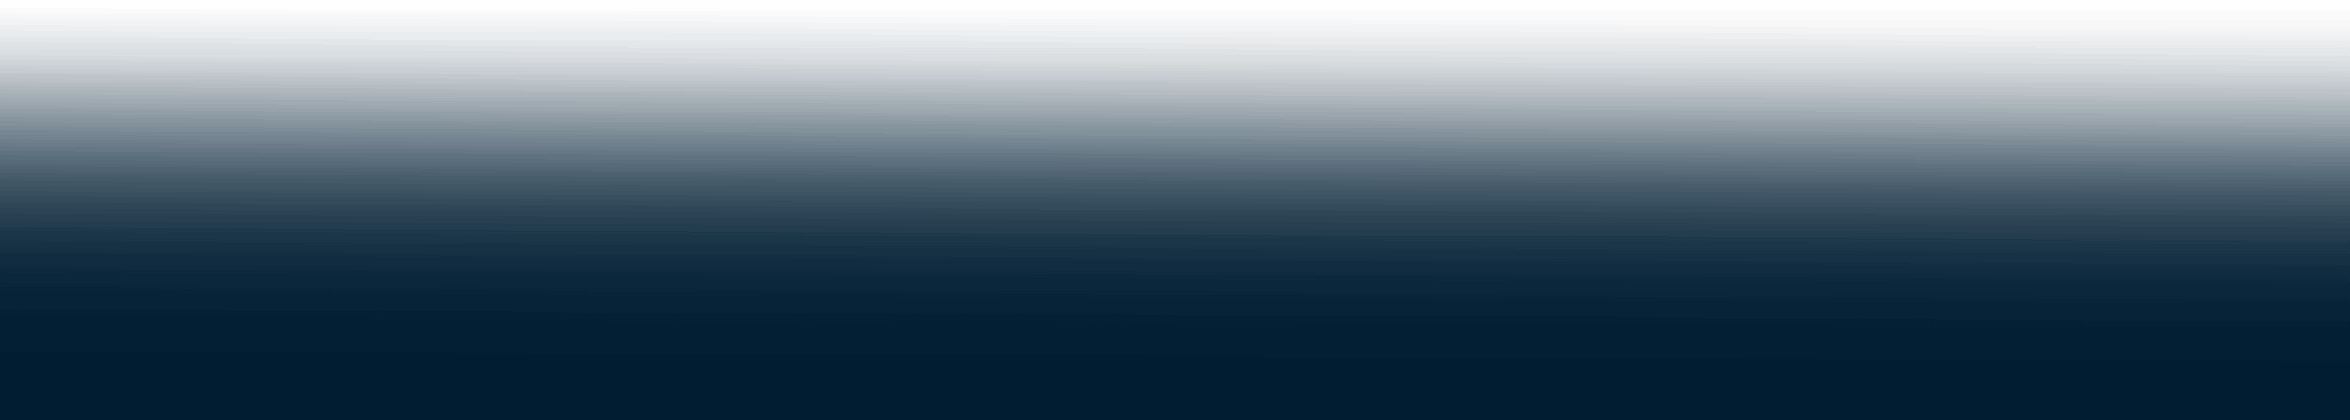 https://www.renewvation.ca/wp-content/uploads/2019/05/blue_gradient-1.png